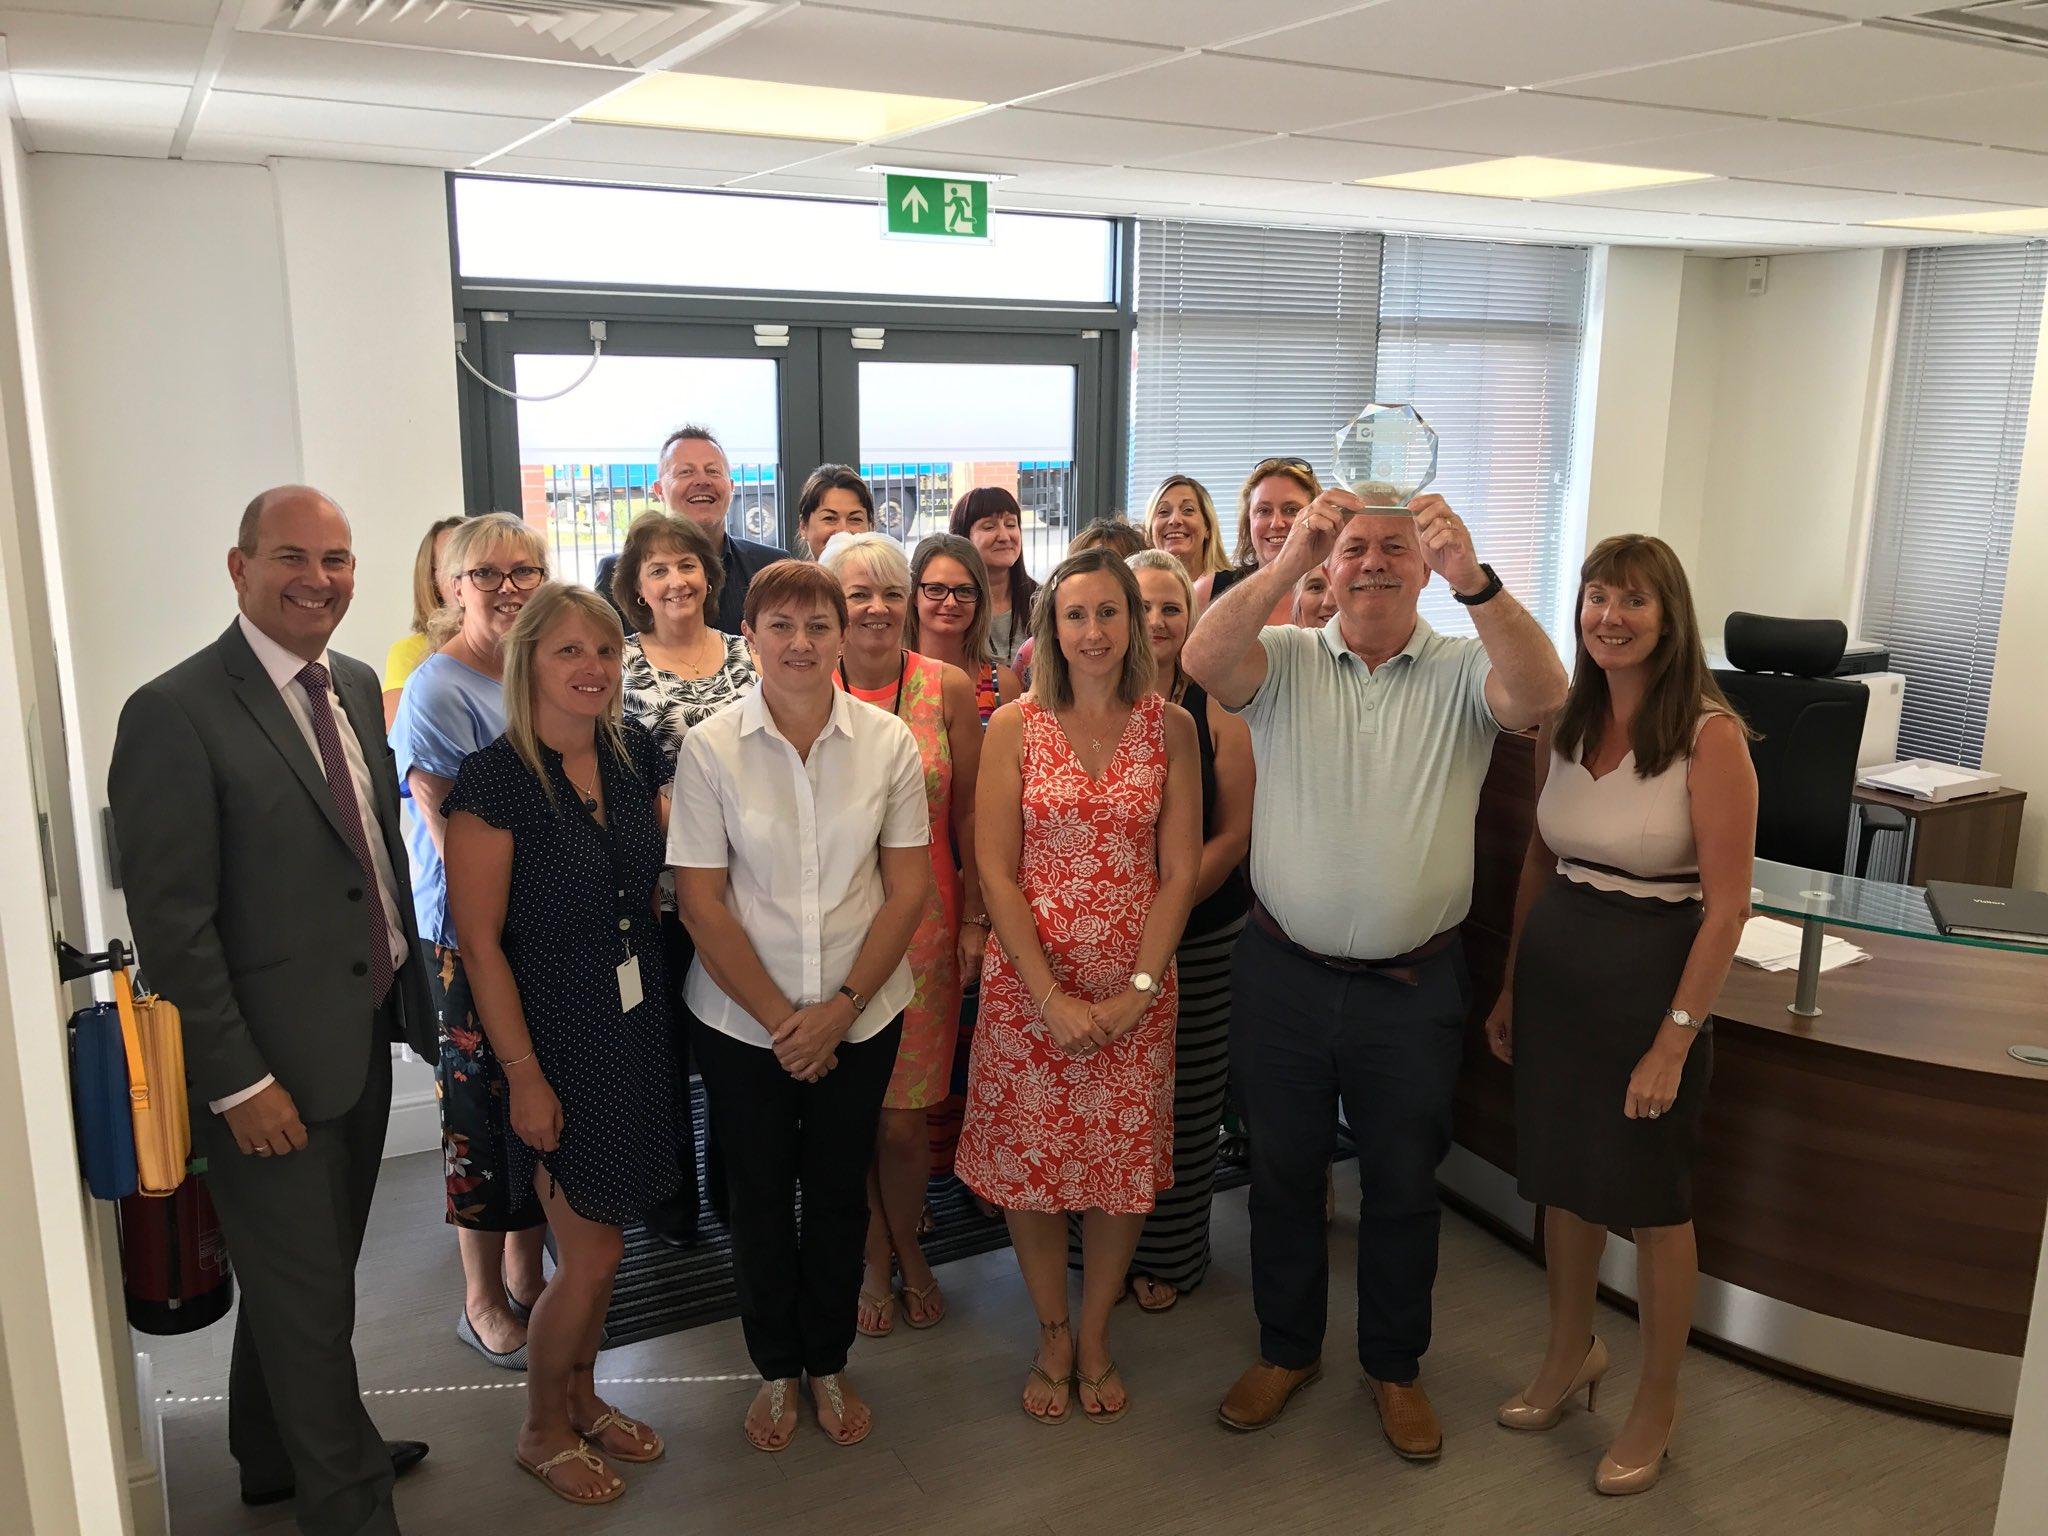 The Lakes Bathrooms Team celebrating their award win